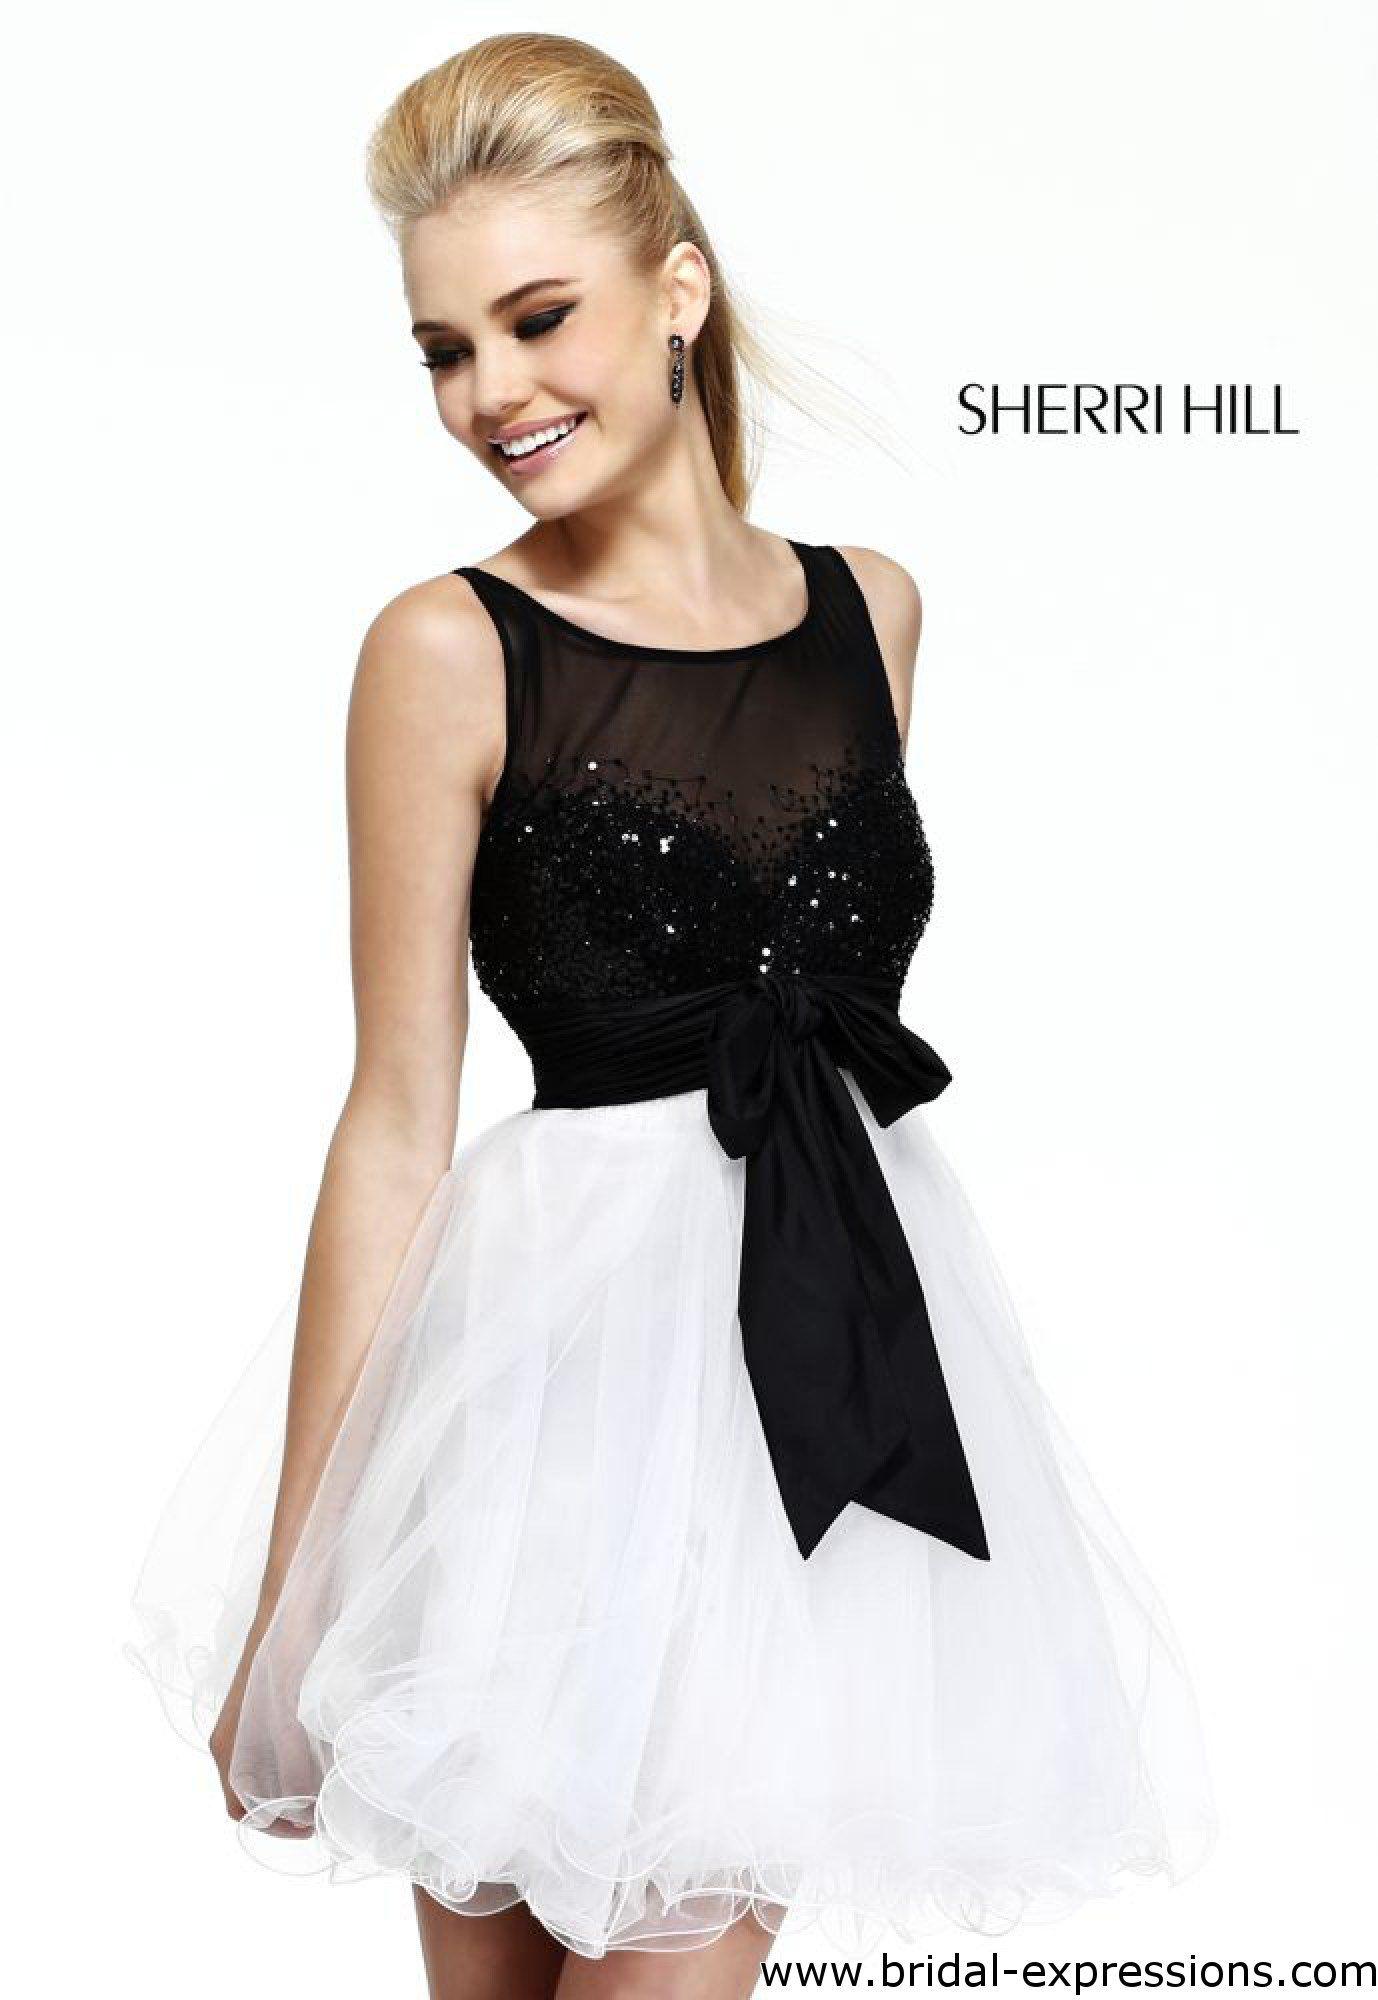 Sherri hill short homecoming dress available in blackhotpink